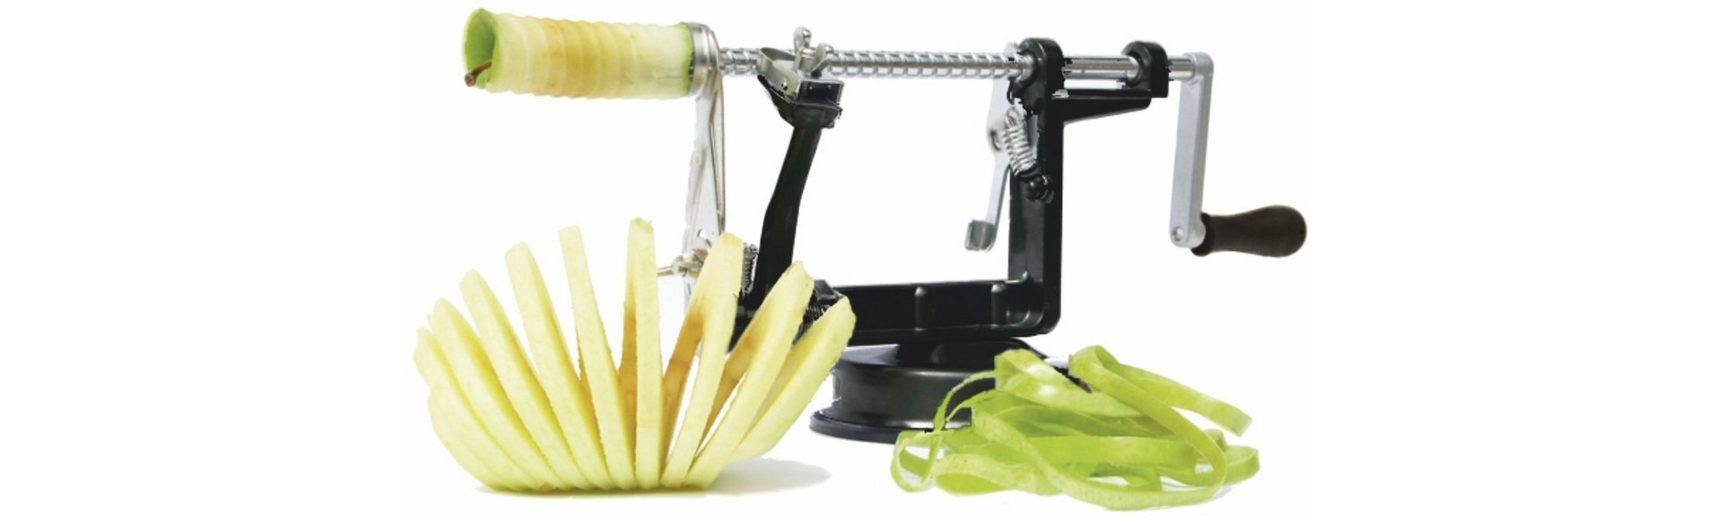 Maximex Apfelschäler 3in1